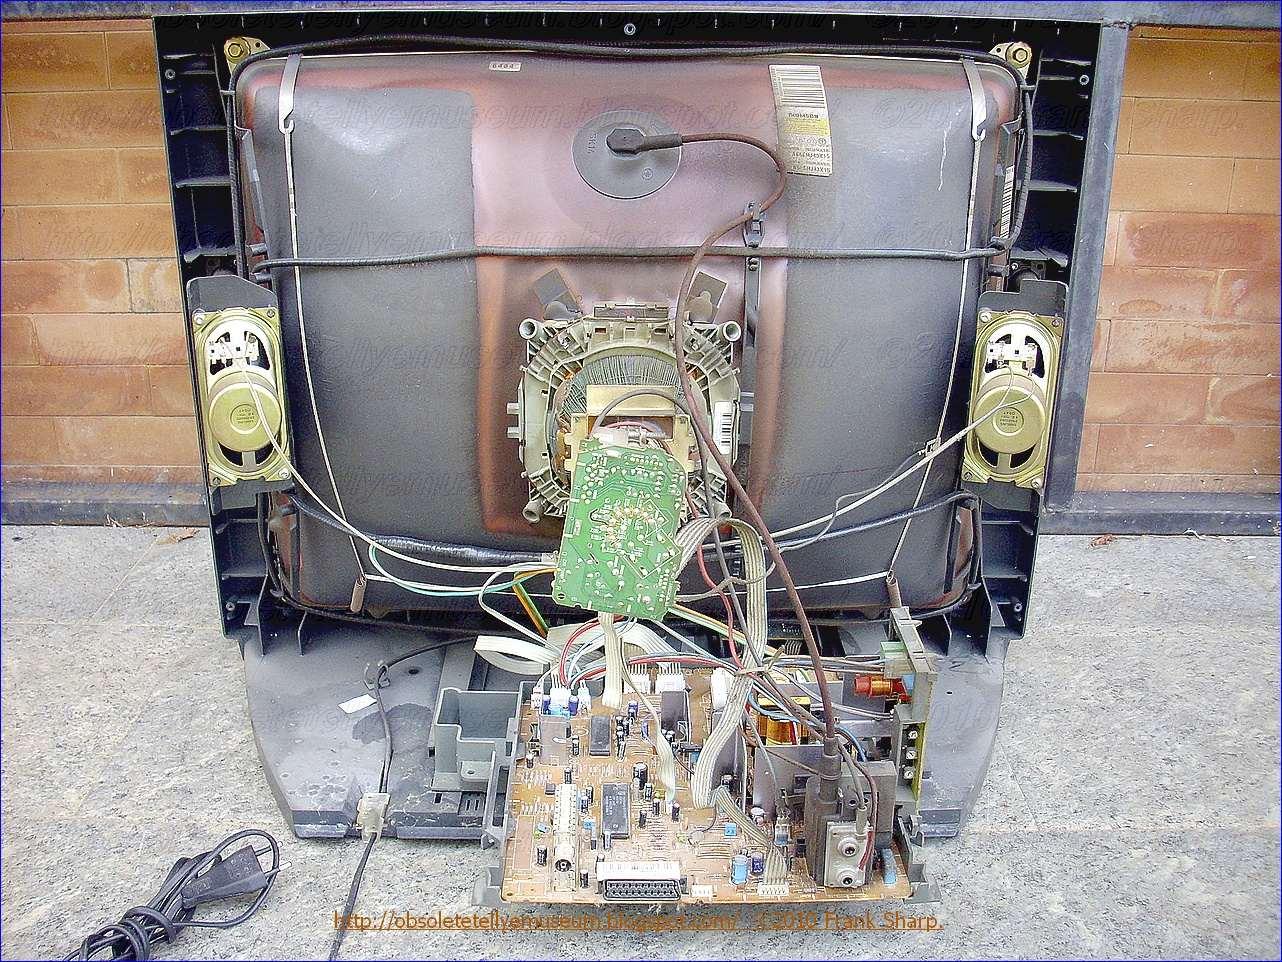 small resolution of  wiring diagram on spa obsolete technology tellye thomson 28dg17e blackpearl 413 on spa motor